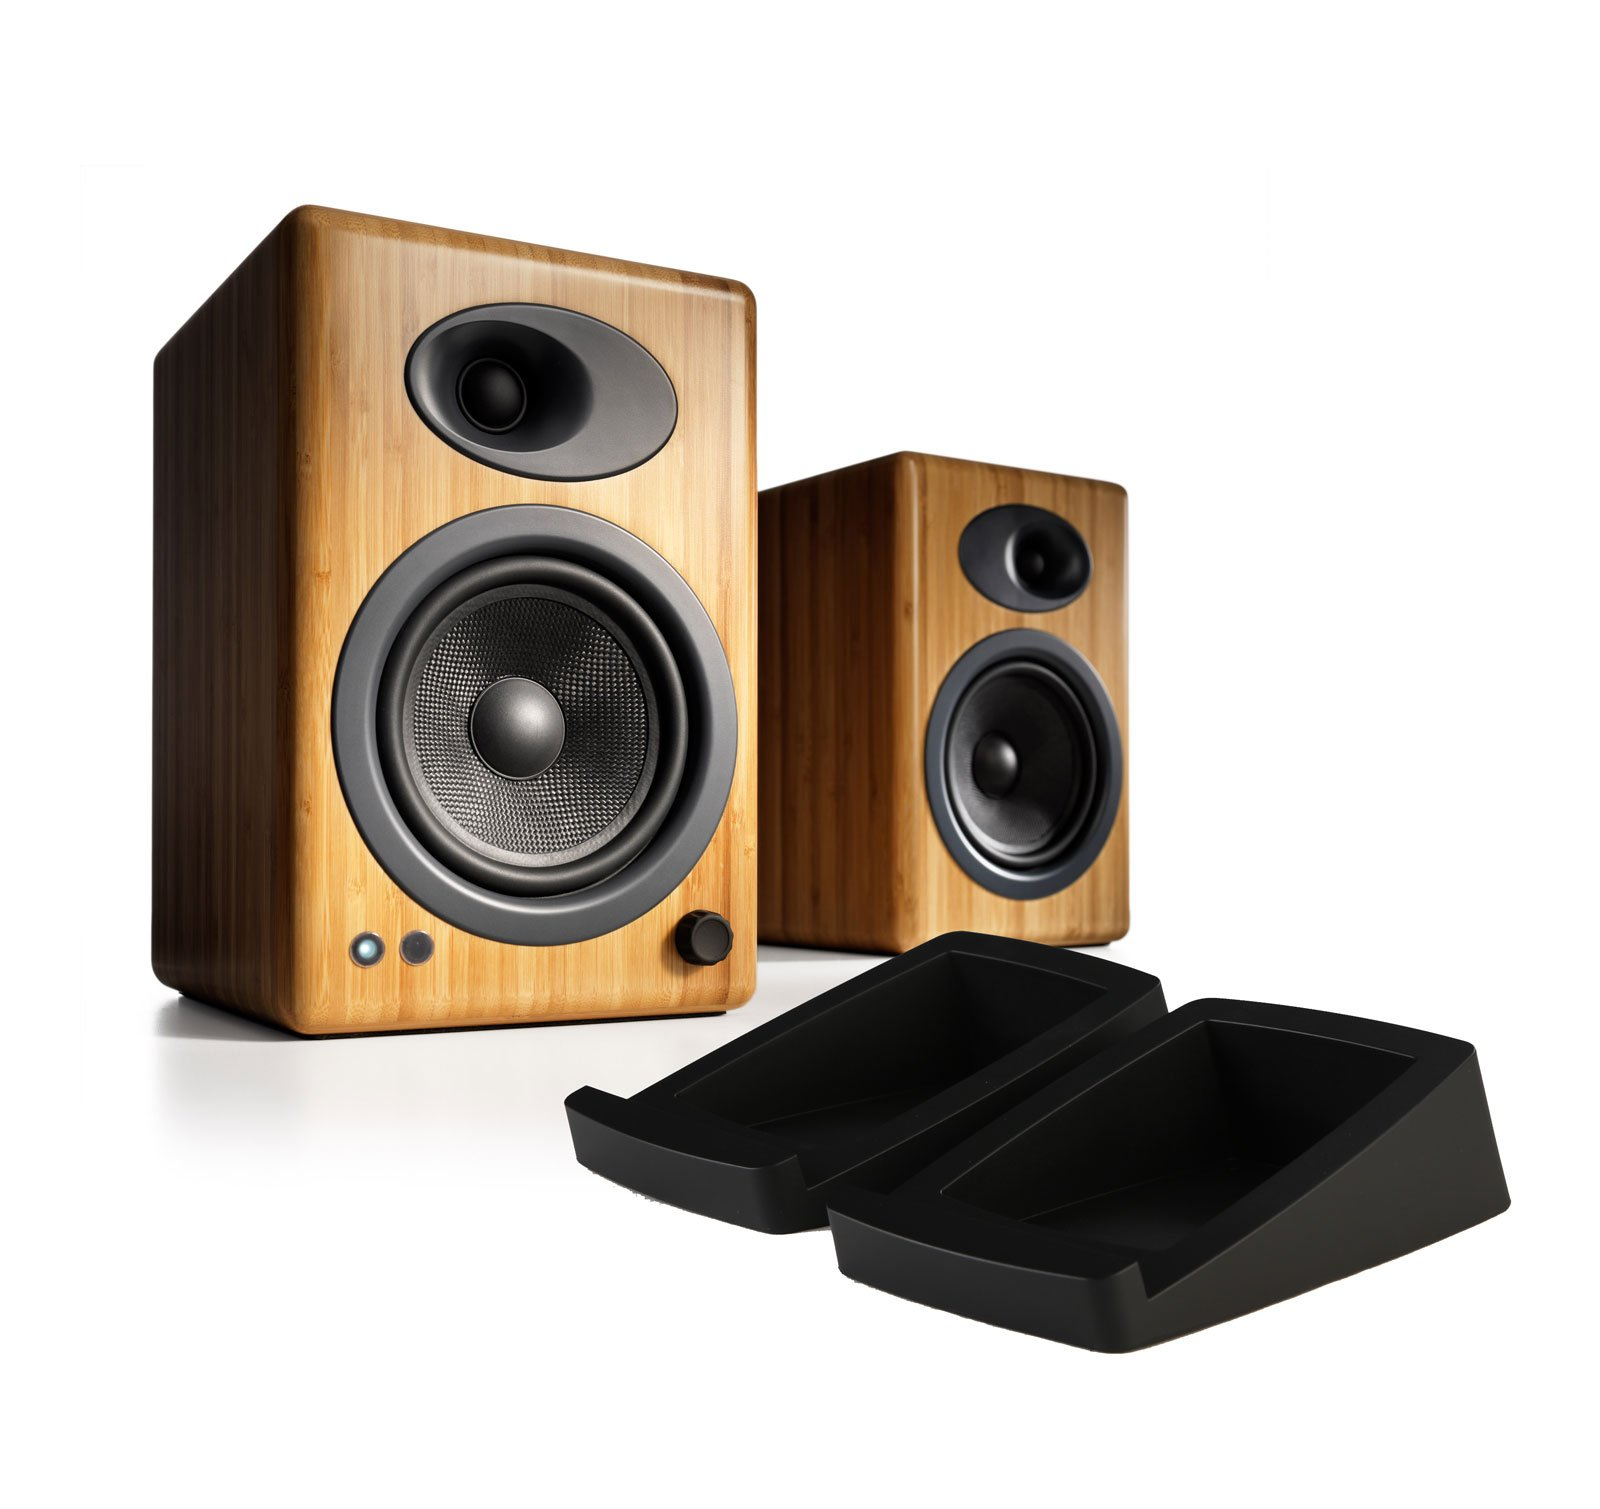 Audioengine A5+ Powered Desktop Speaker (Pr) - Bamboo w/DS2 Desktop Speaker Stands Bundle by Audioengine (Image #1)